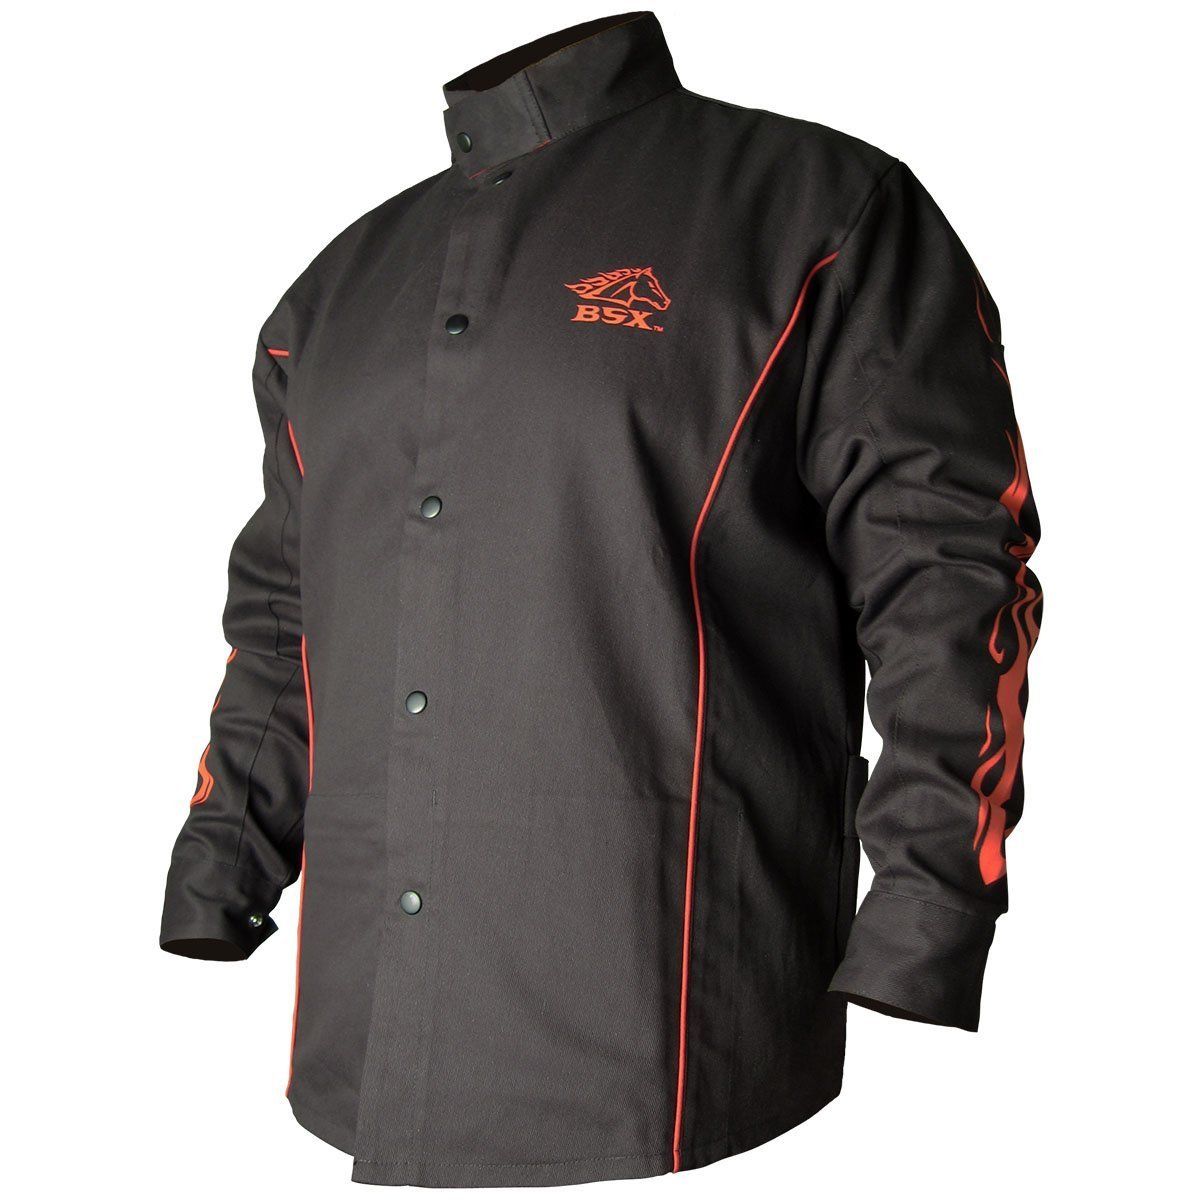 BLACK STALLION BSX® FR Welding Jacket - Black w/Red Flames - MEDIUM Revco BX9C-MD